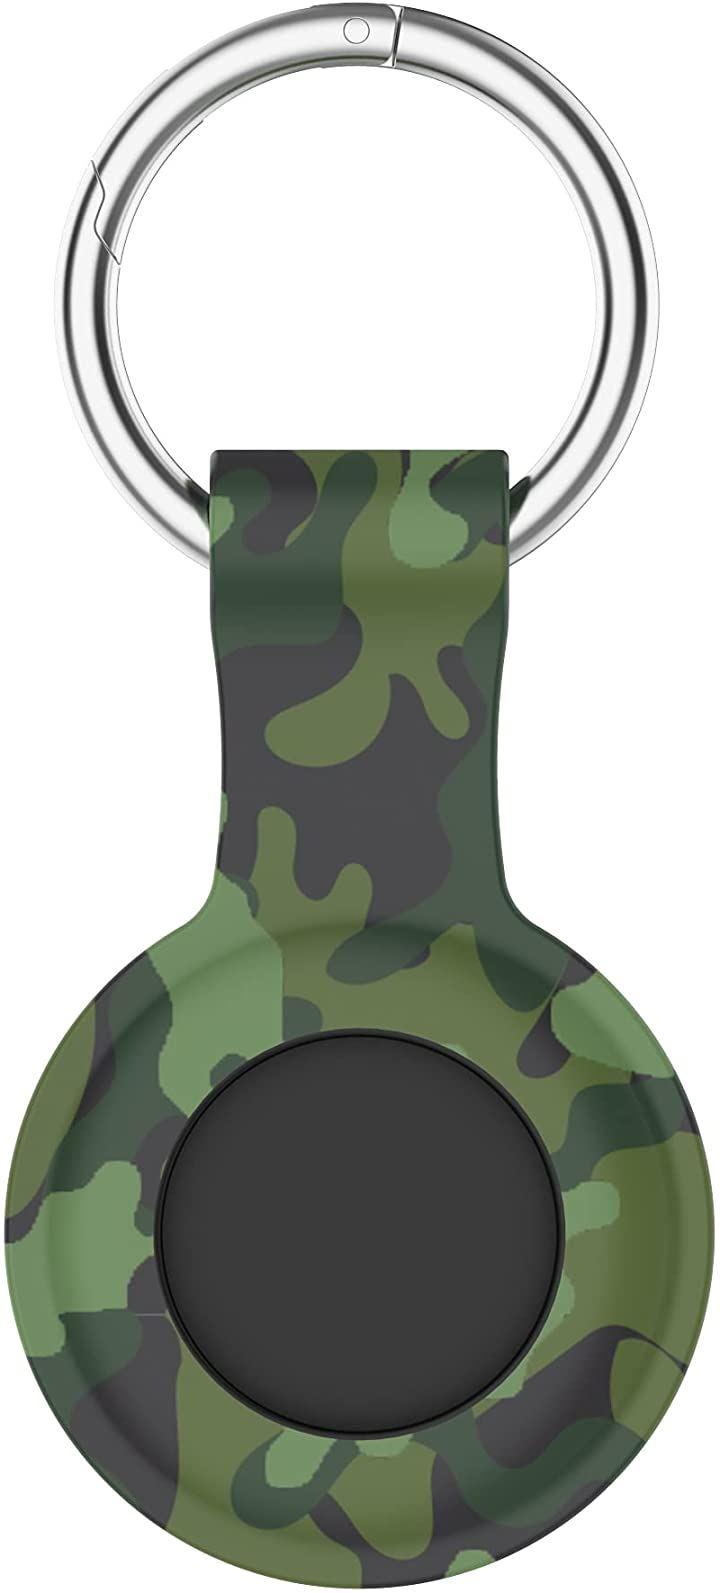 AirTag ケース シリコン キャンプグッズ 盗難防止 保護 軽量 薄型 迷彩 AirTag対応保護カバー(迷彩グリーン)